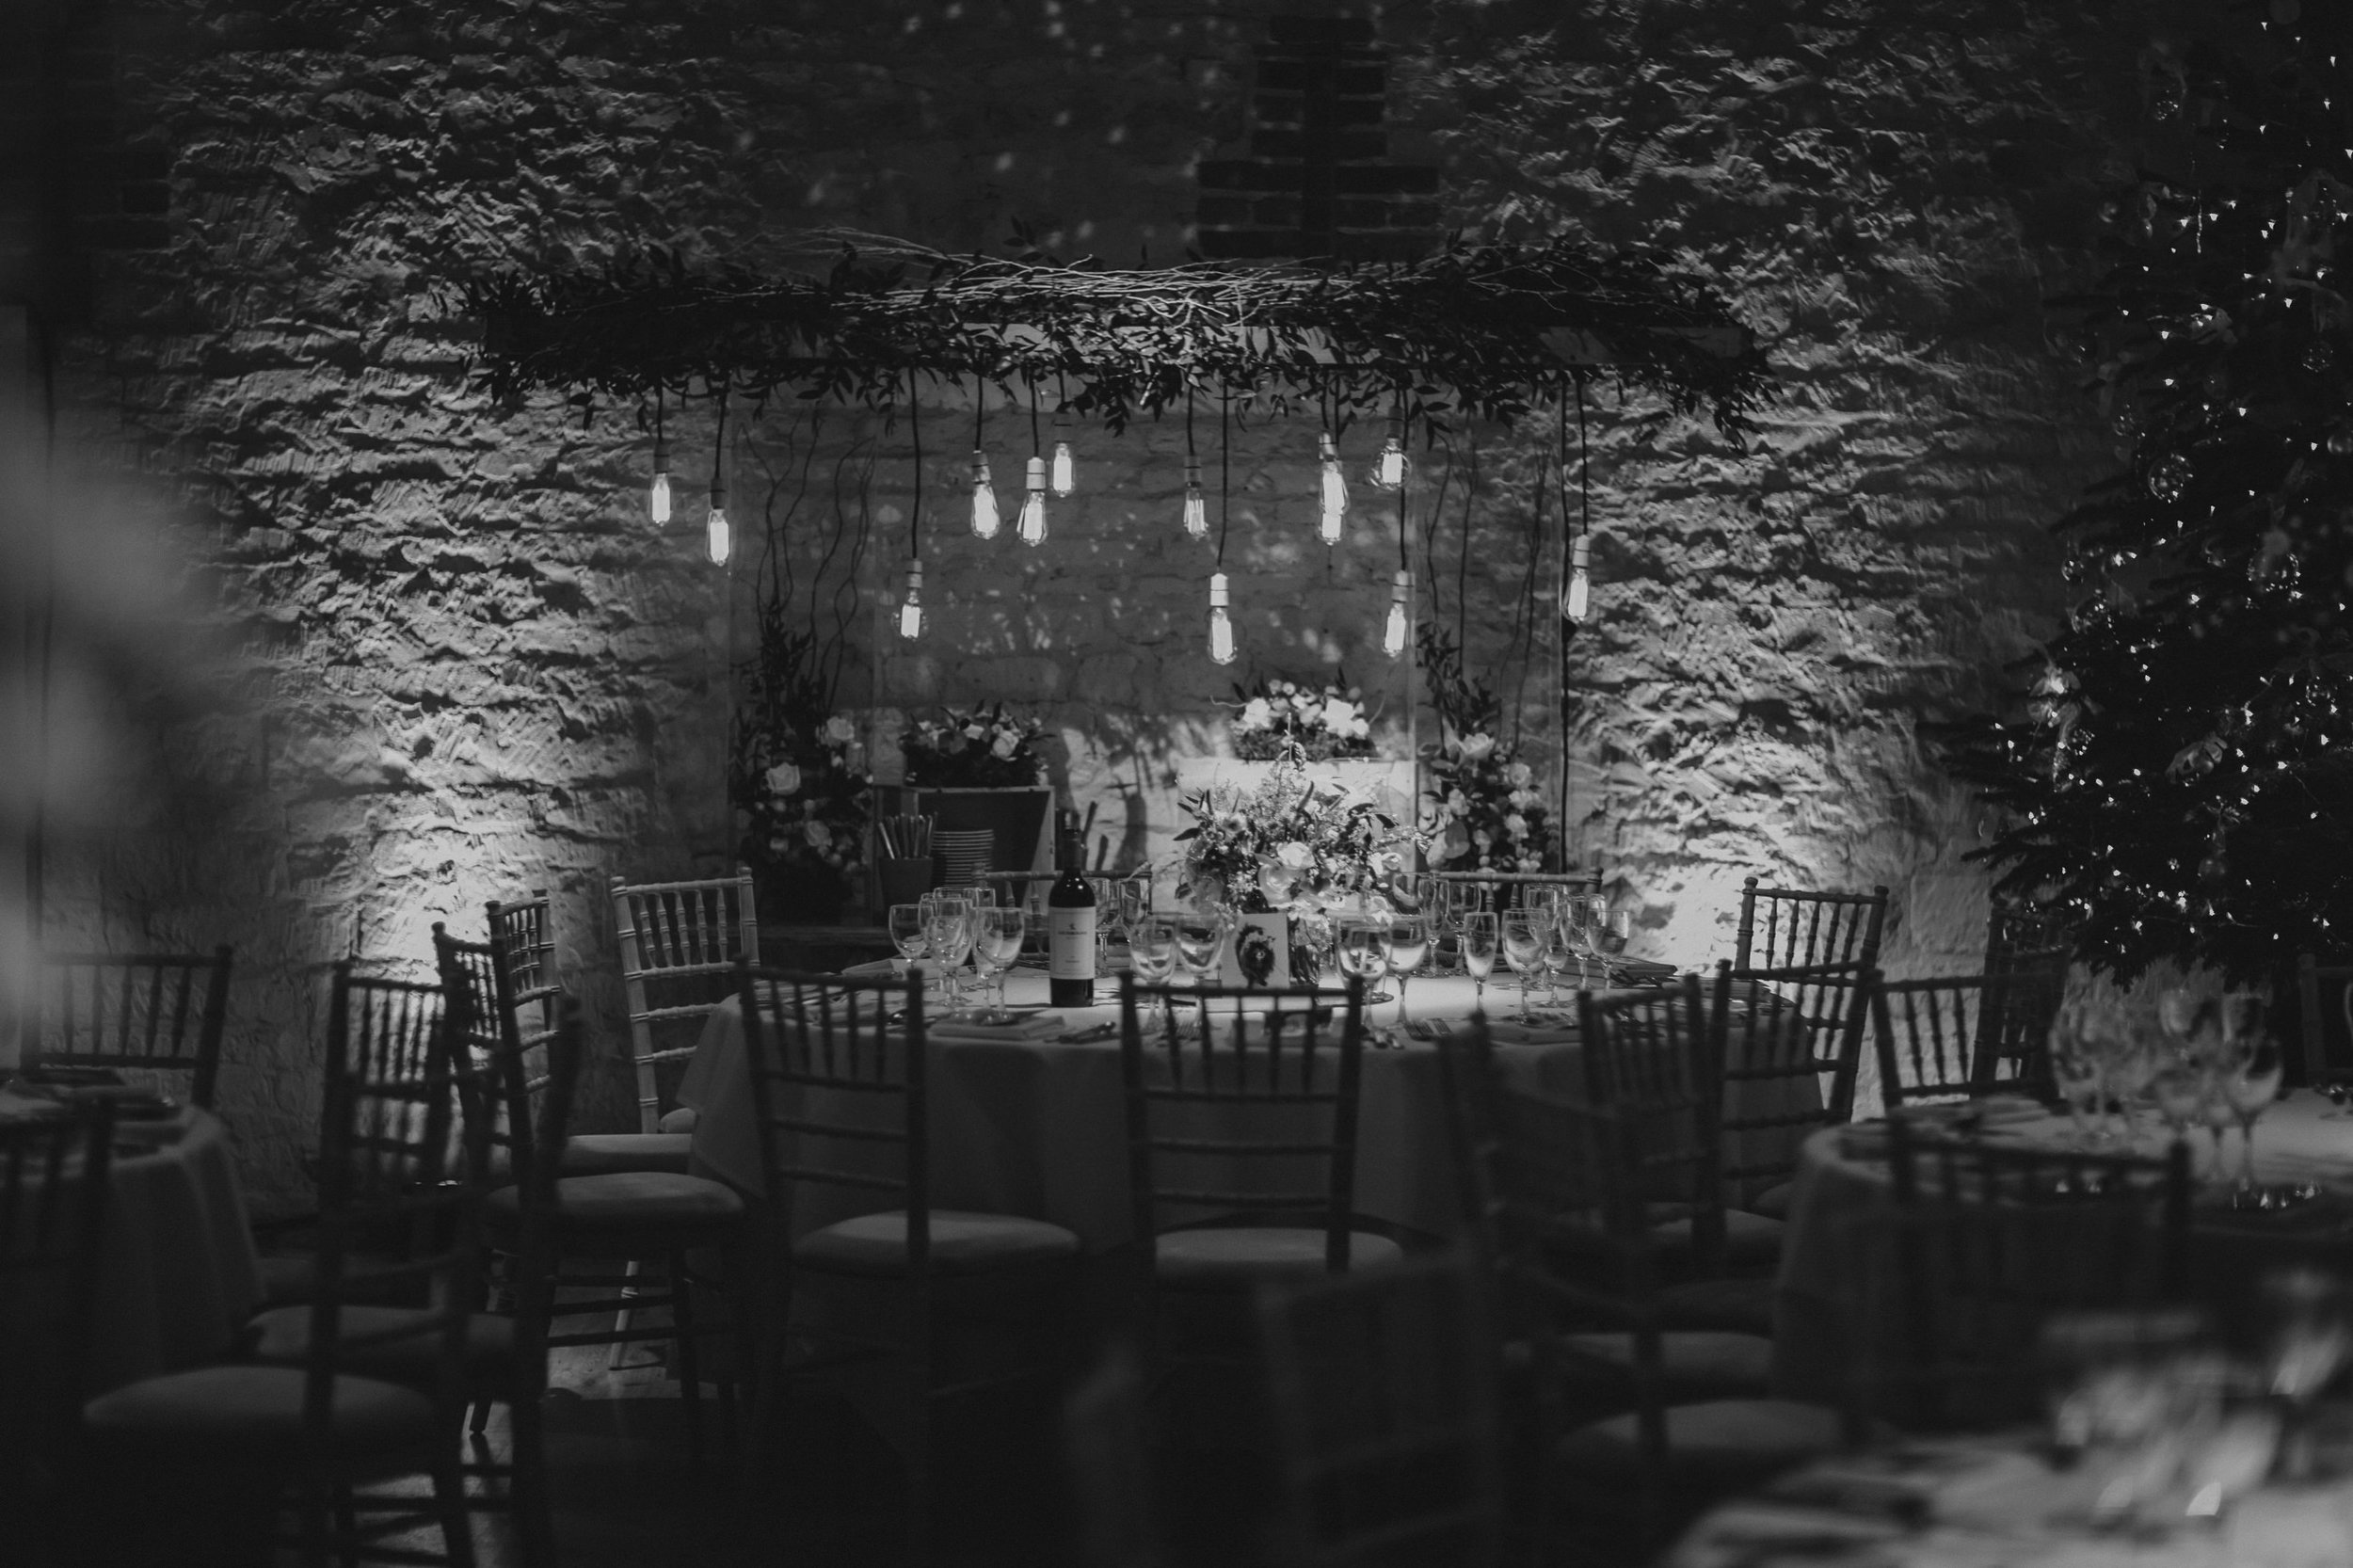 Jenny Packham dress Bury Court Barn Hampshire Wedding Photographer Gione da Silva_008.jpg